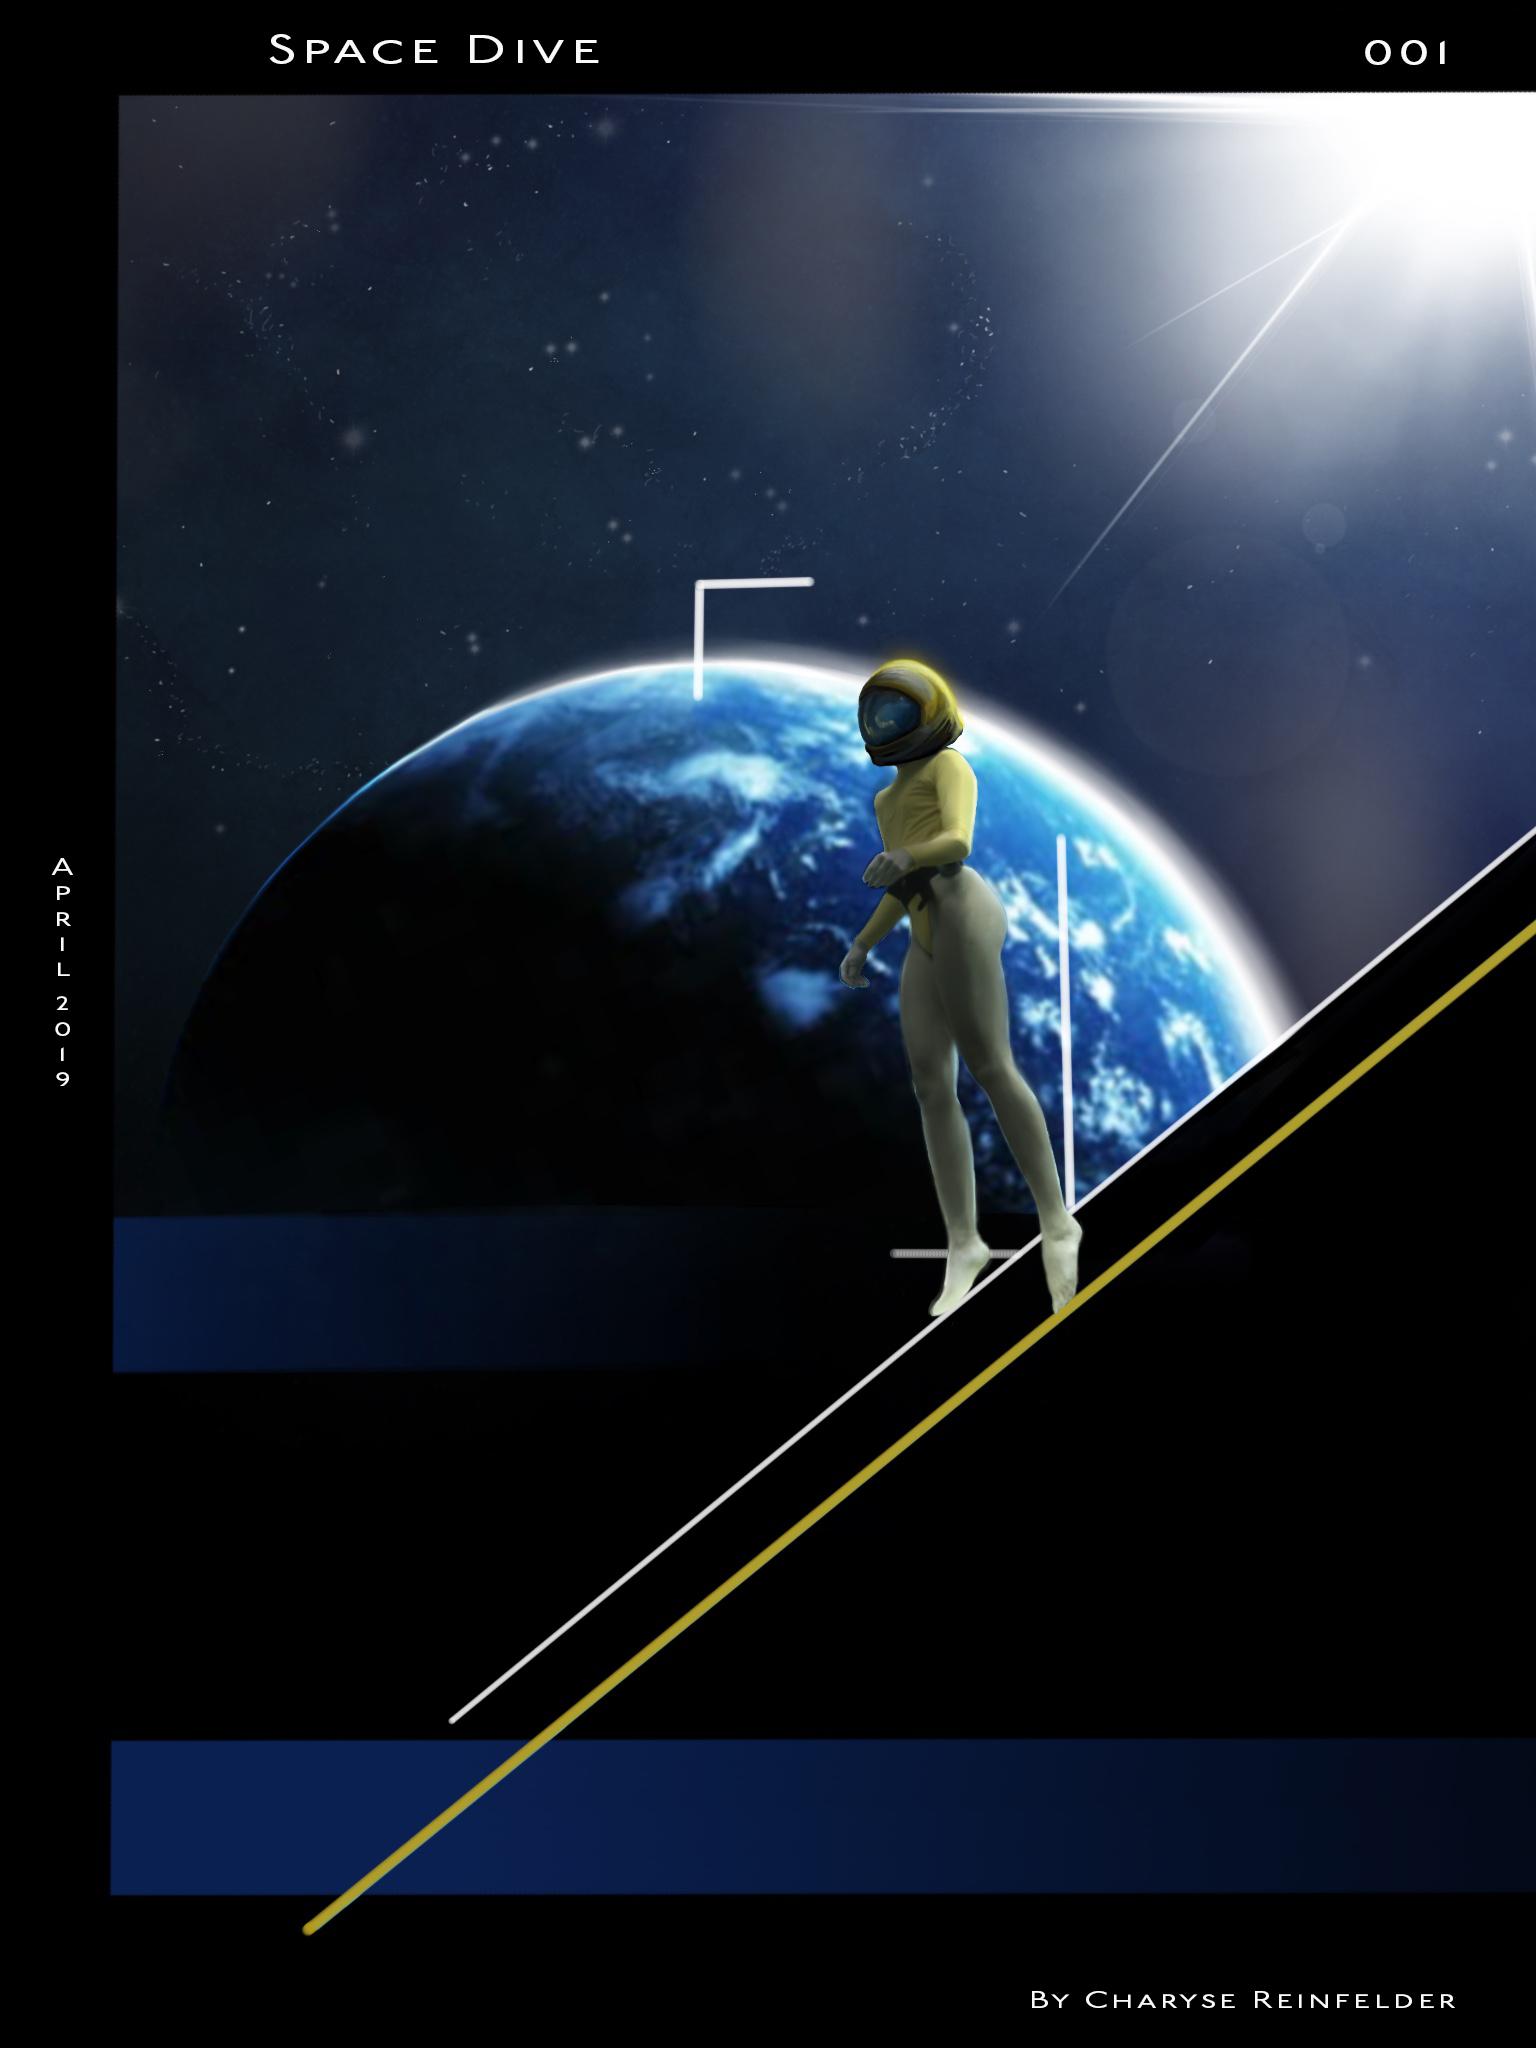 Charyse-Reinfelder-Space-Dive-Poster-001.jpg